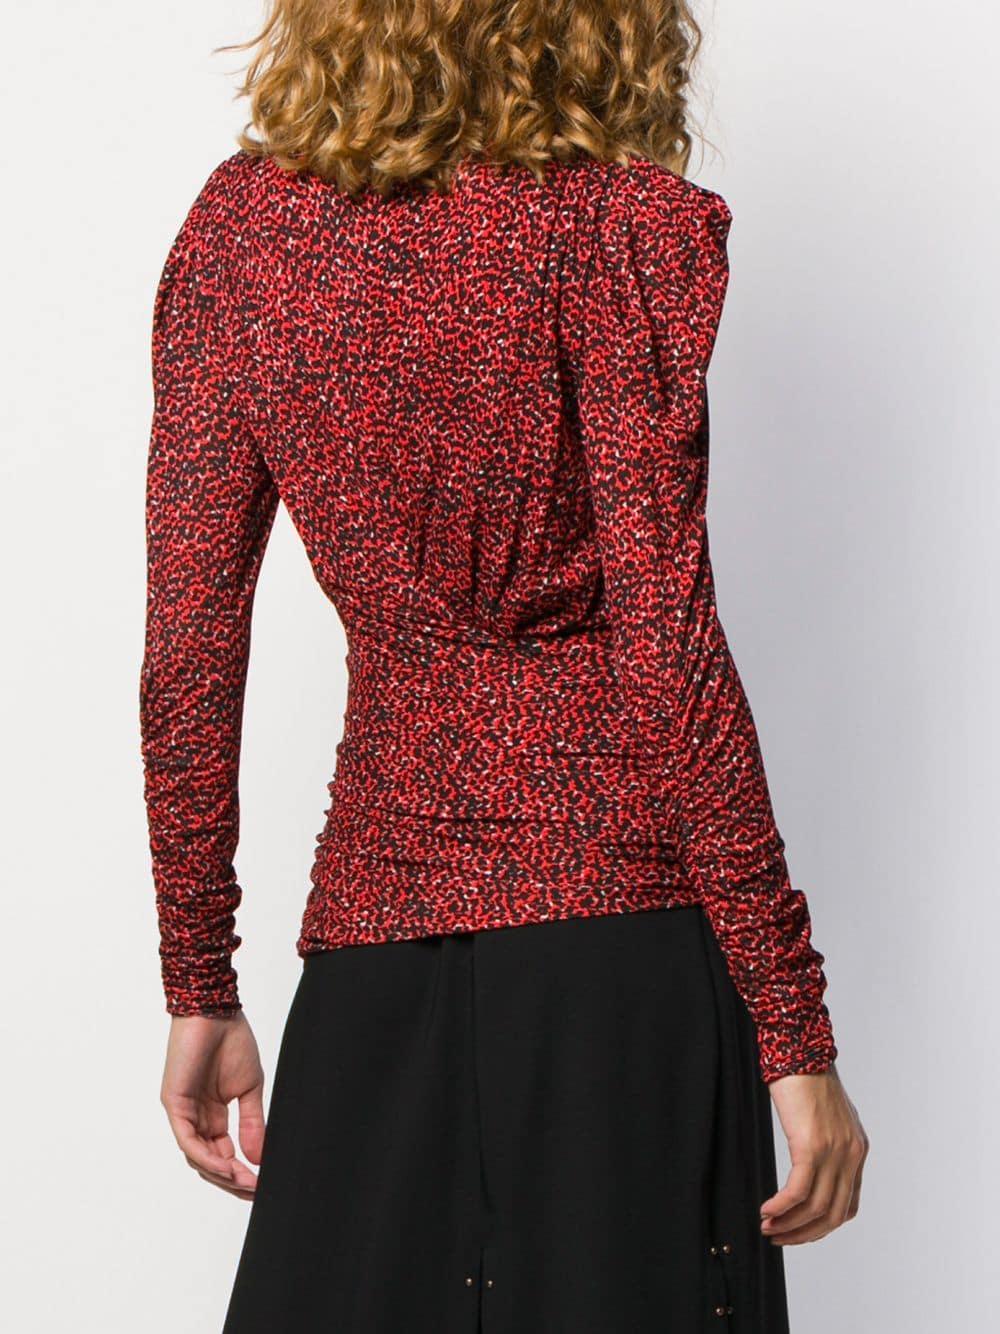 Top Jalford Synthétique Isabel Marant en coloris Rouge